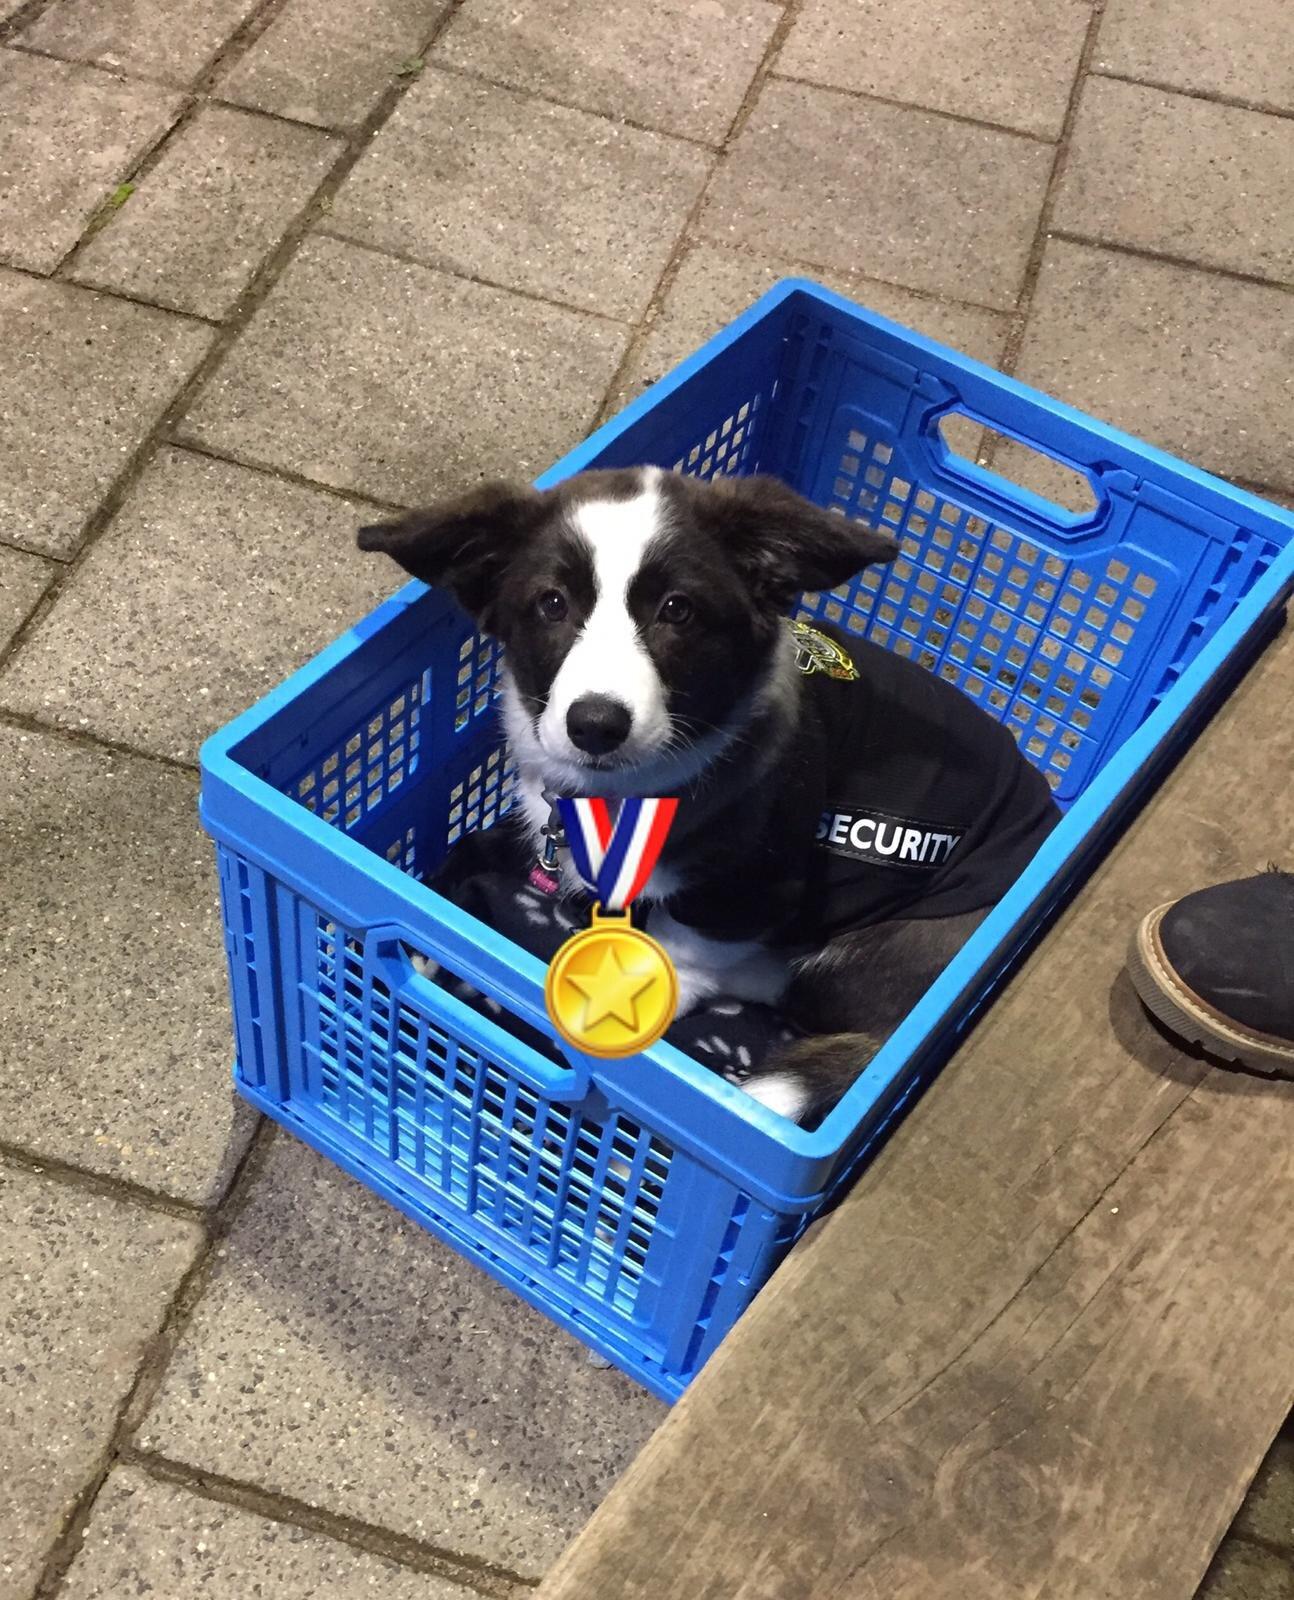 De mascotte kreeg ook een medaille